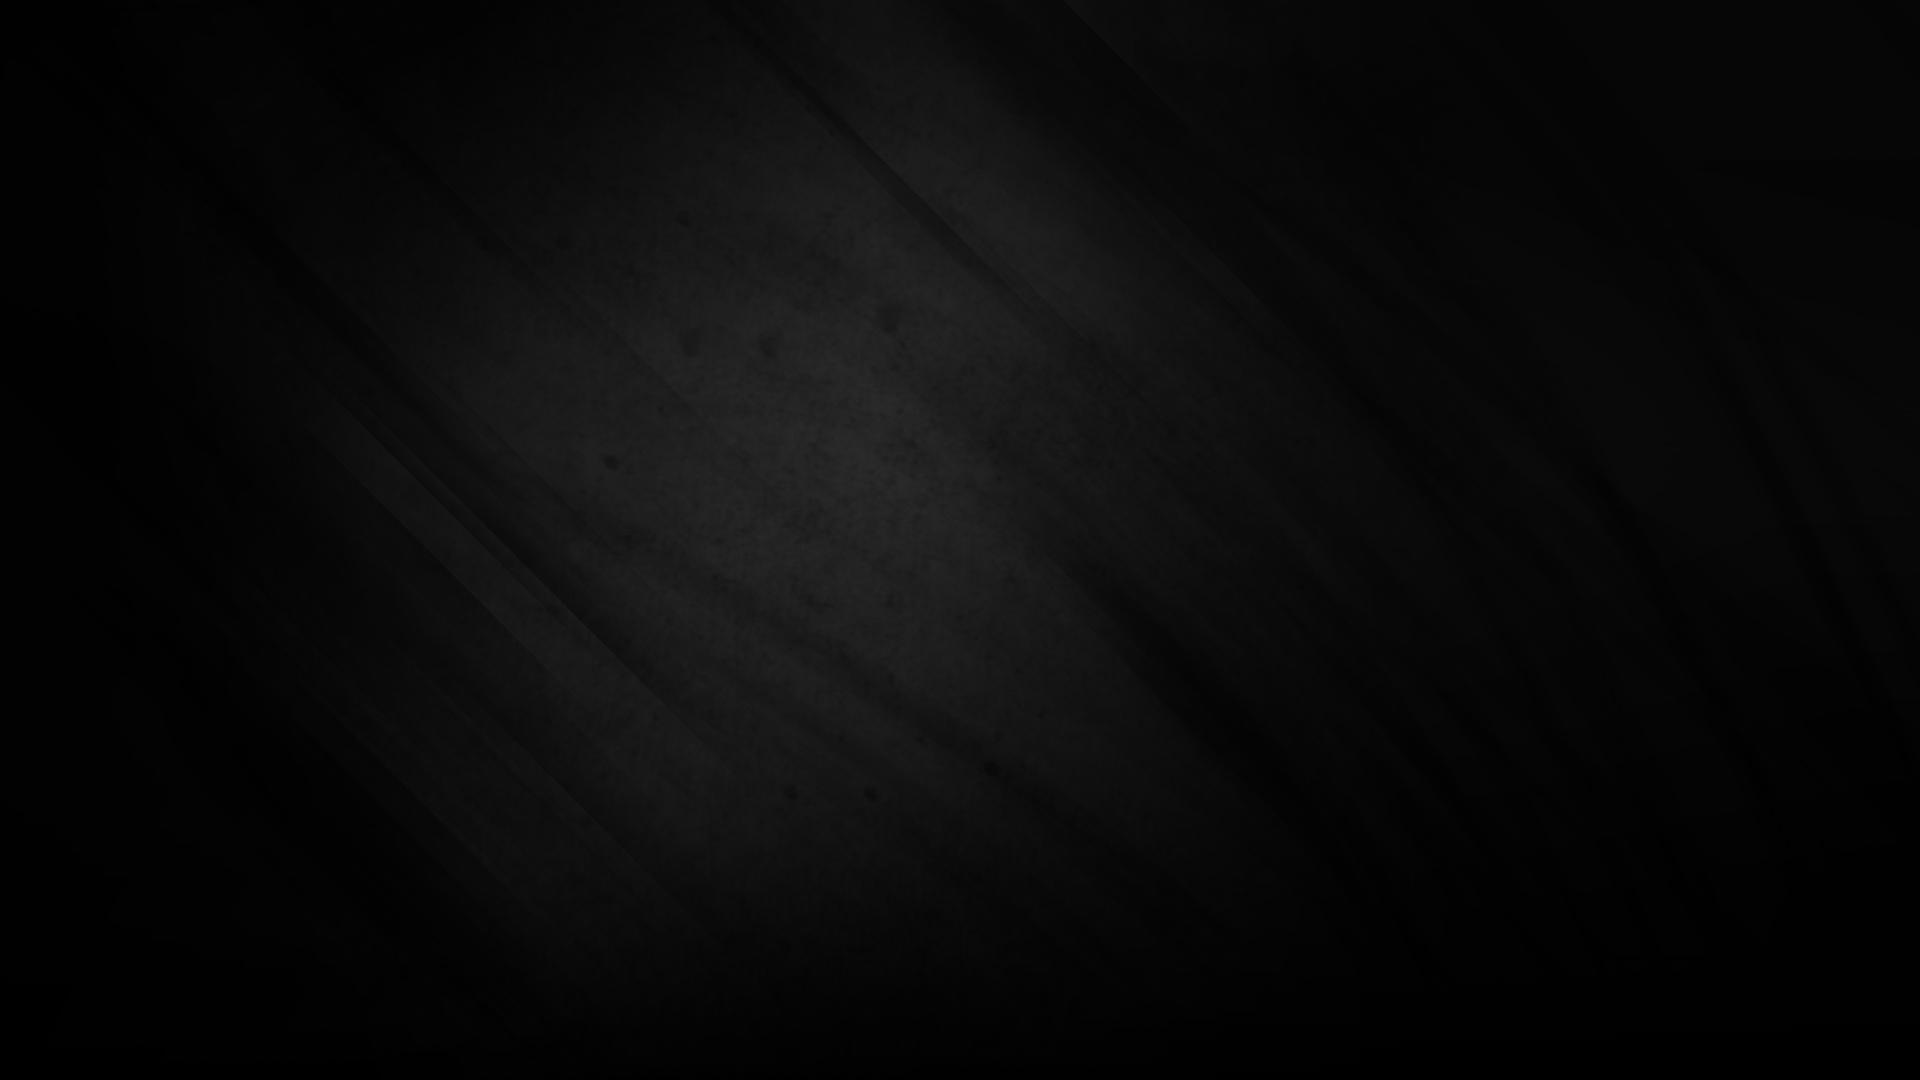 Black Techno Background wallpaper wallpaper hd background desktop 1920x1080